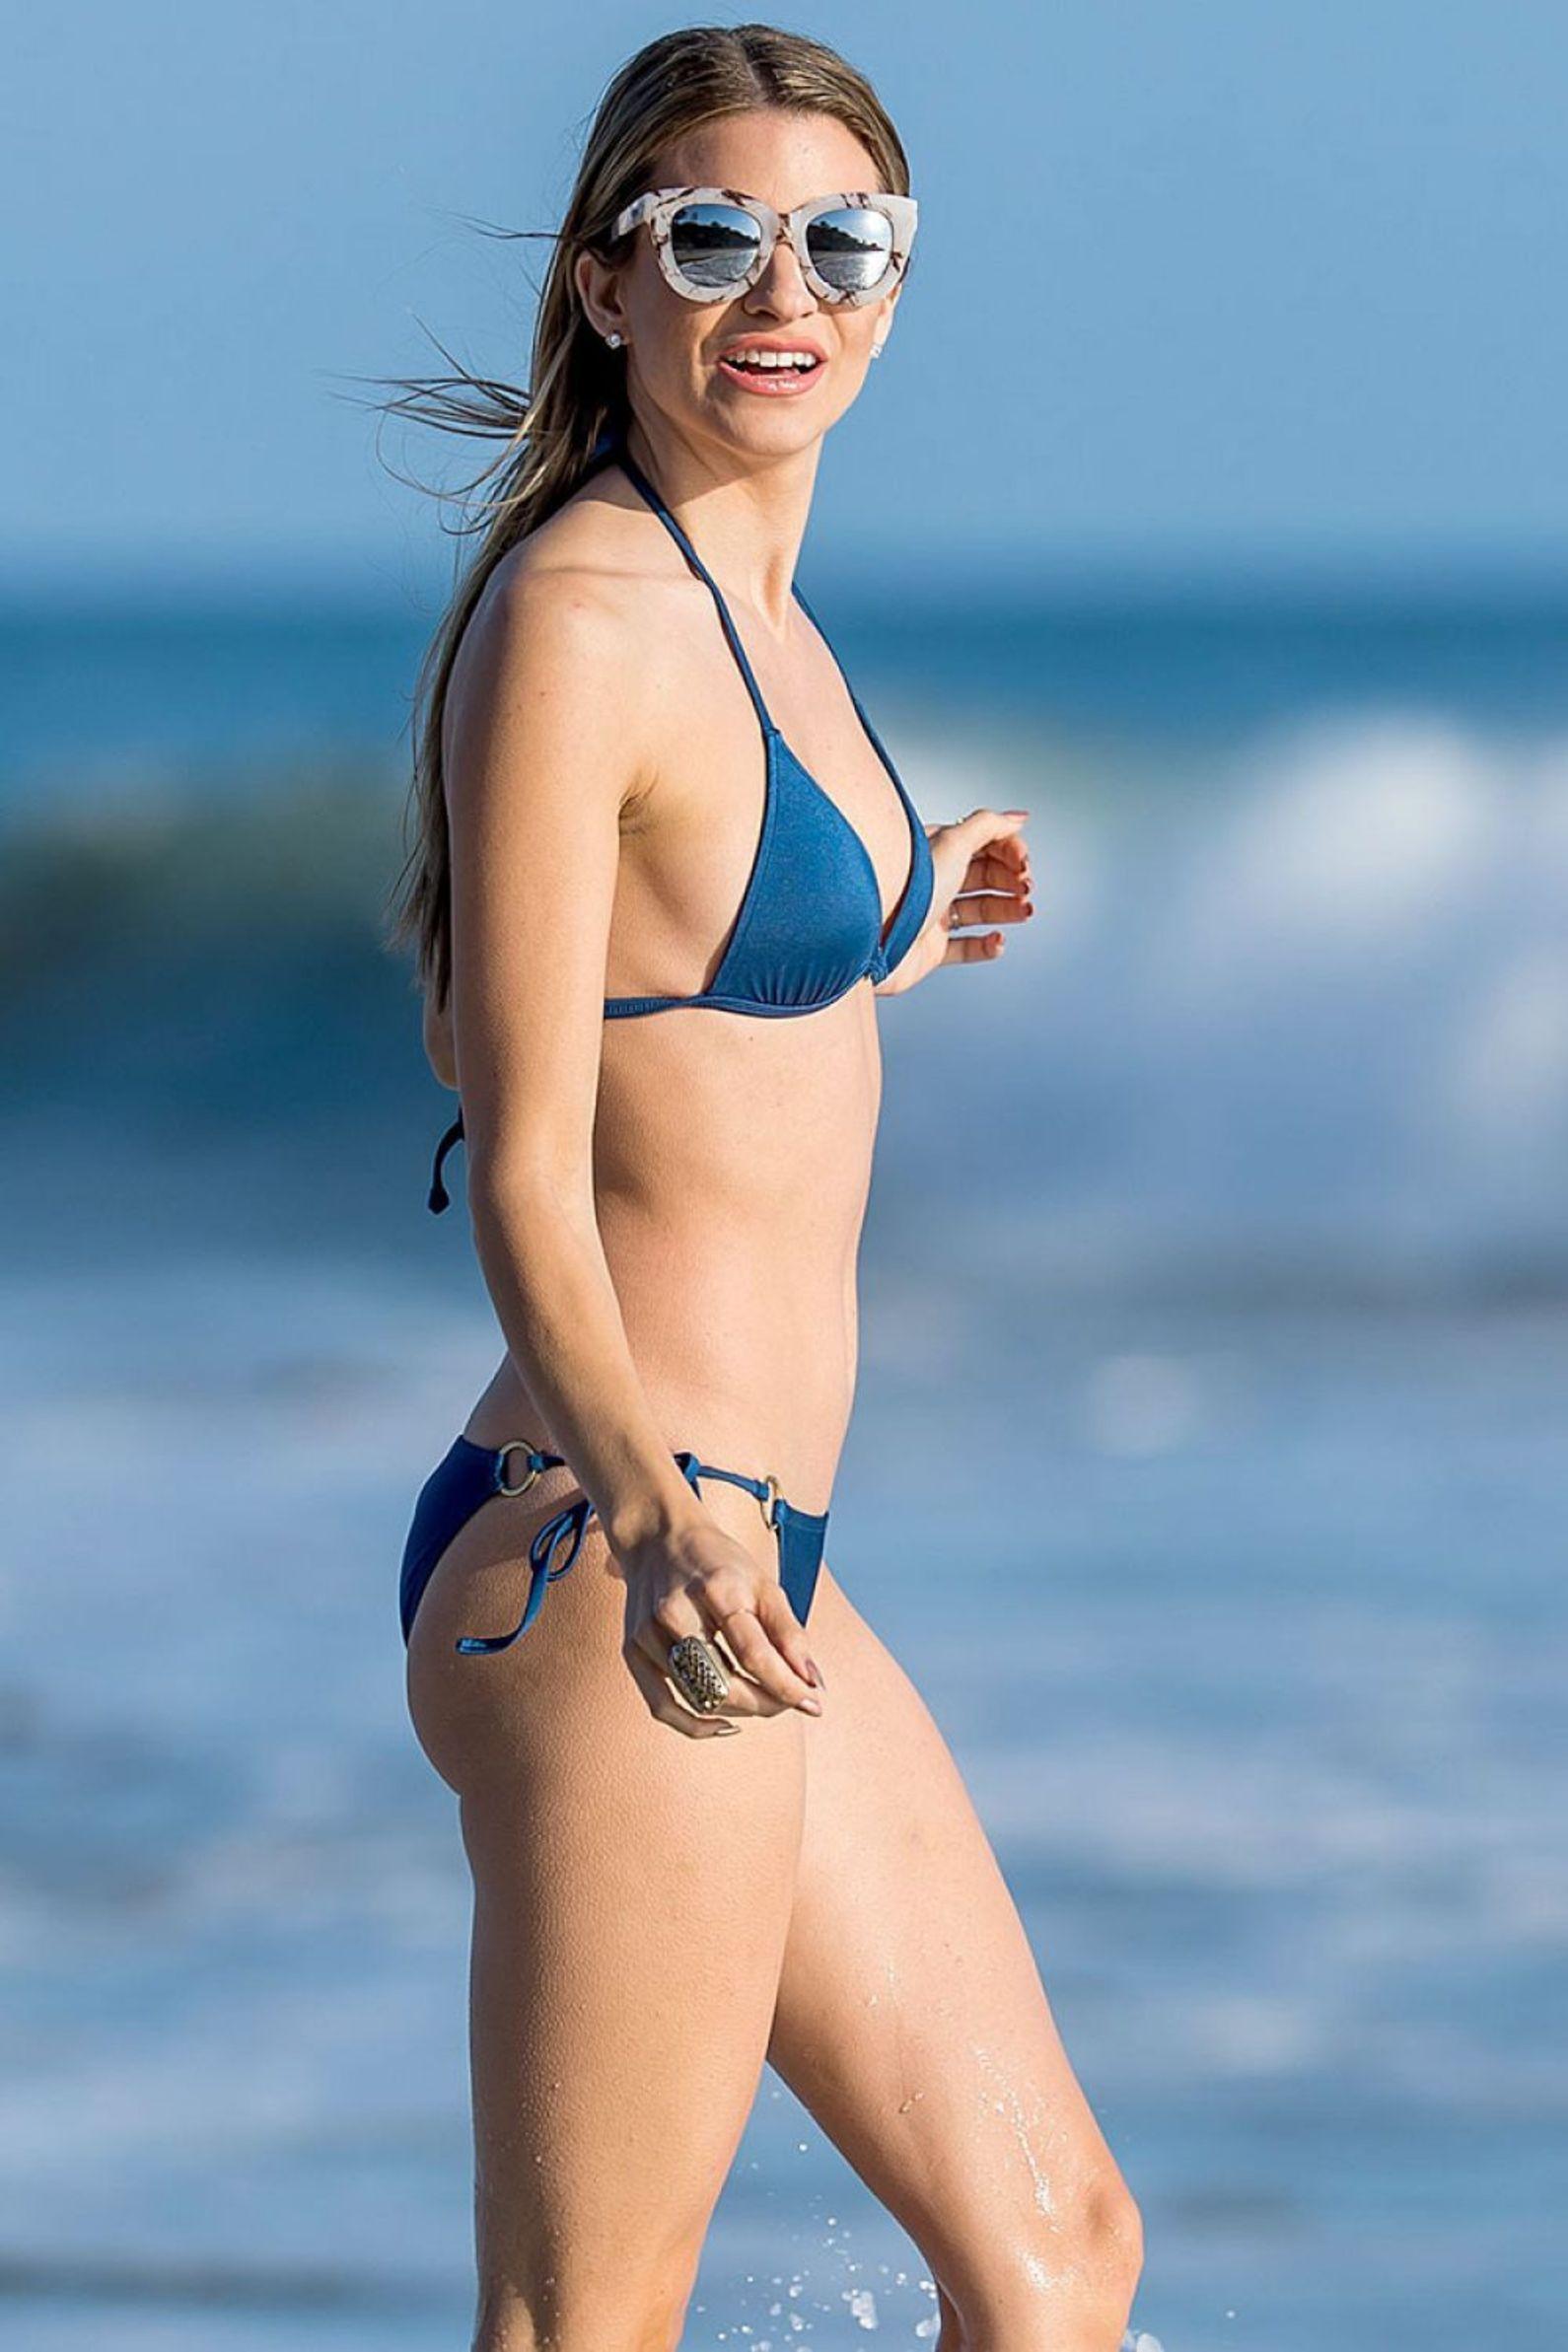 Jenny mollen fappening nude photo,Kelly hall leaked photos Erotic archive Olivia Garson HQ Passionata Swimwear Lingerie,REDDIT Karen Pang